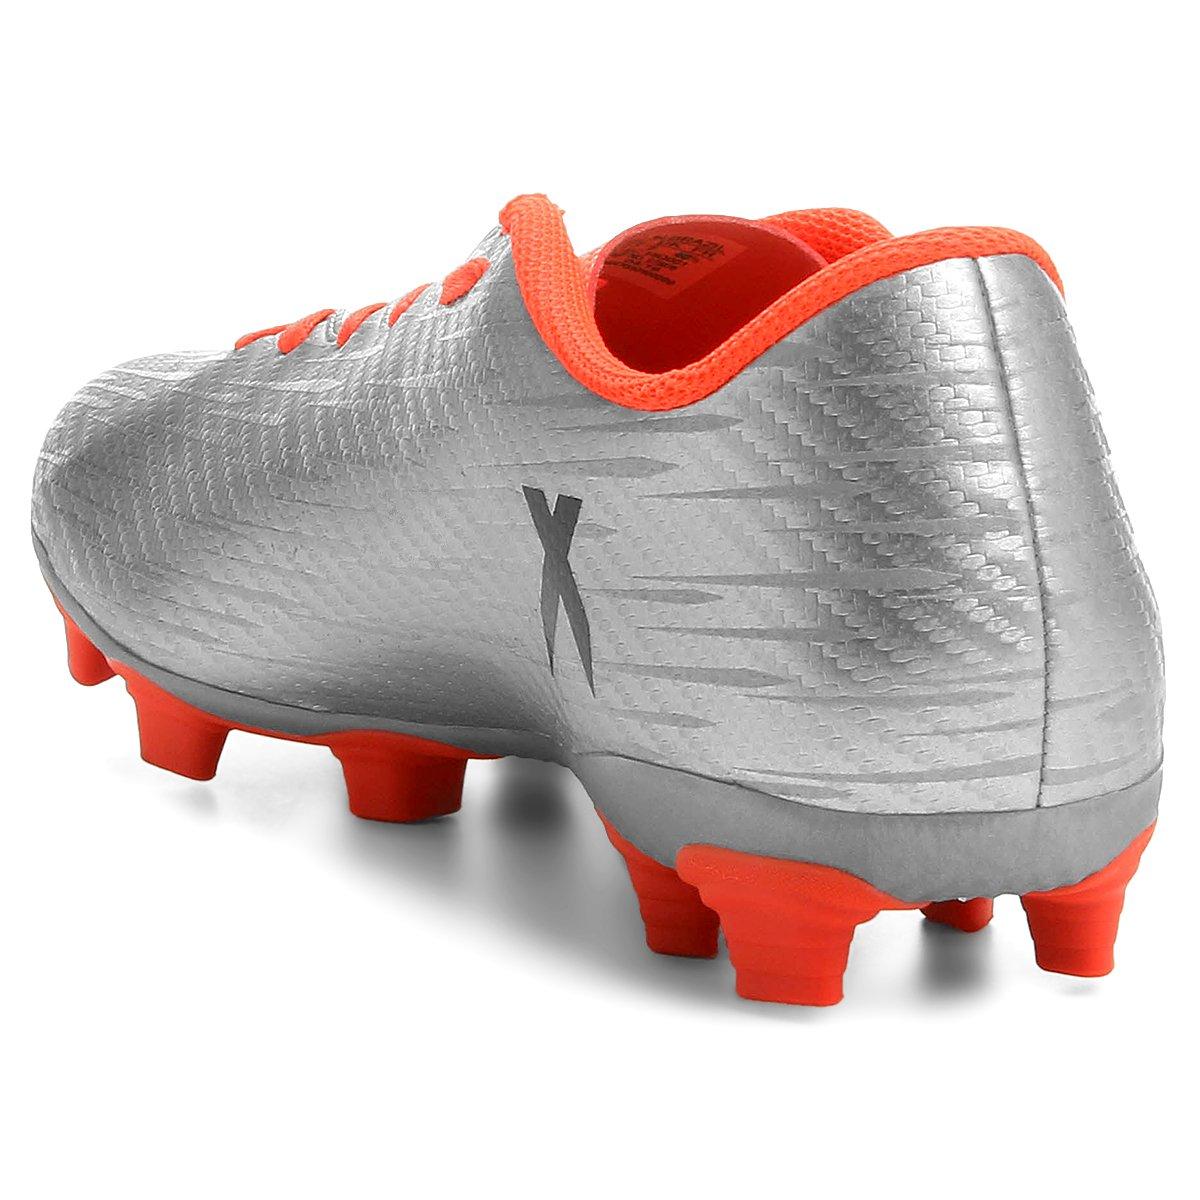 7c3db45866 Chuteira Adidas X 16.4 FXG Campo - Compre Agora